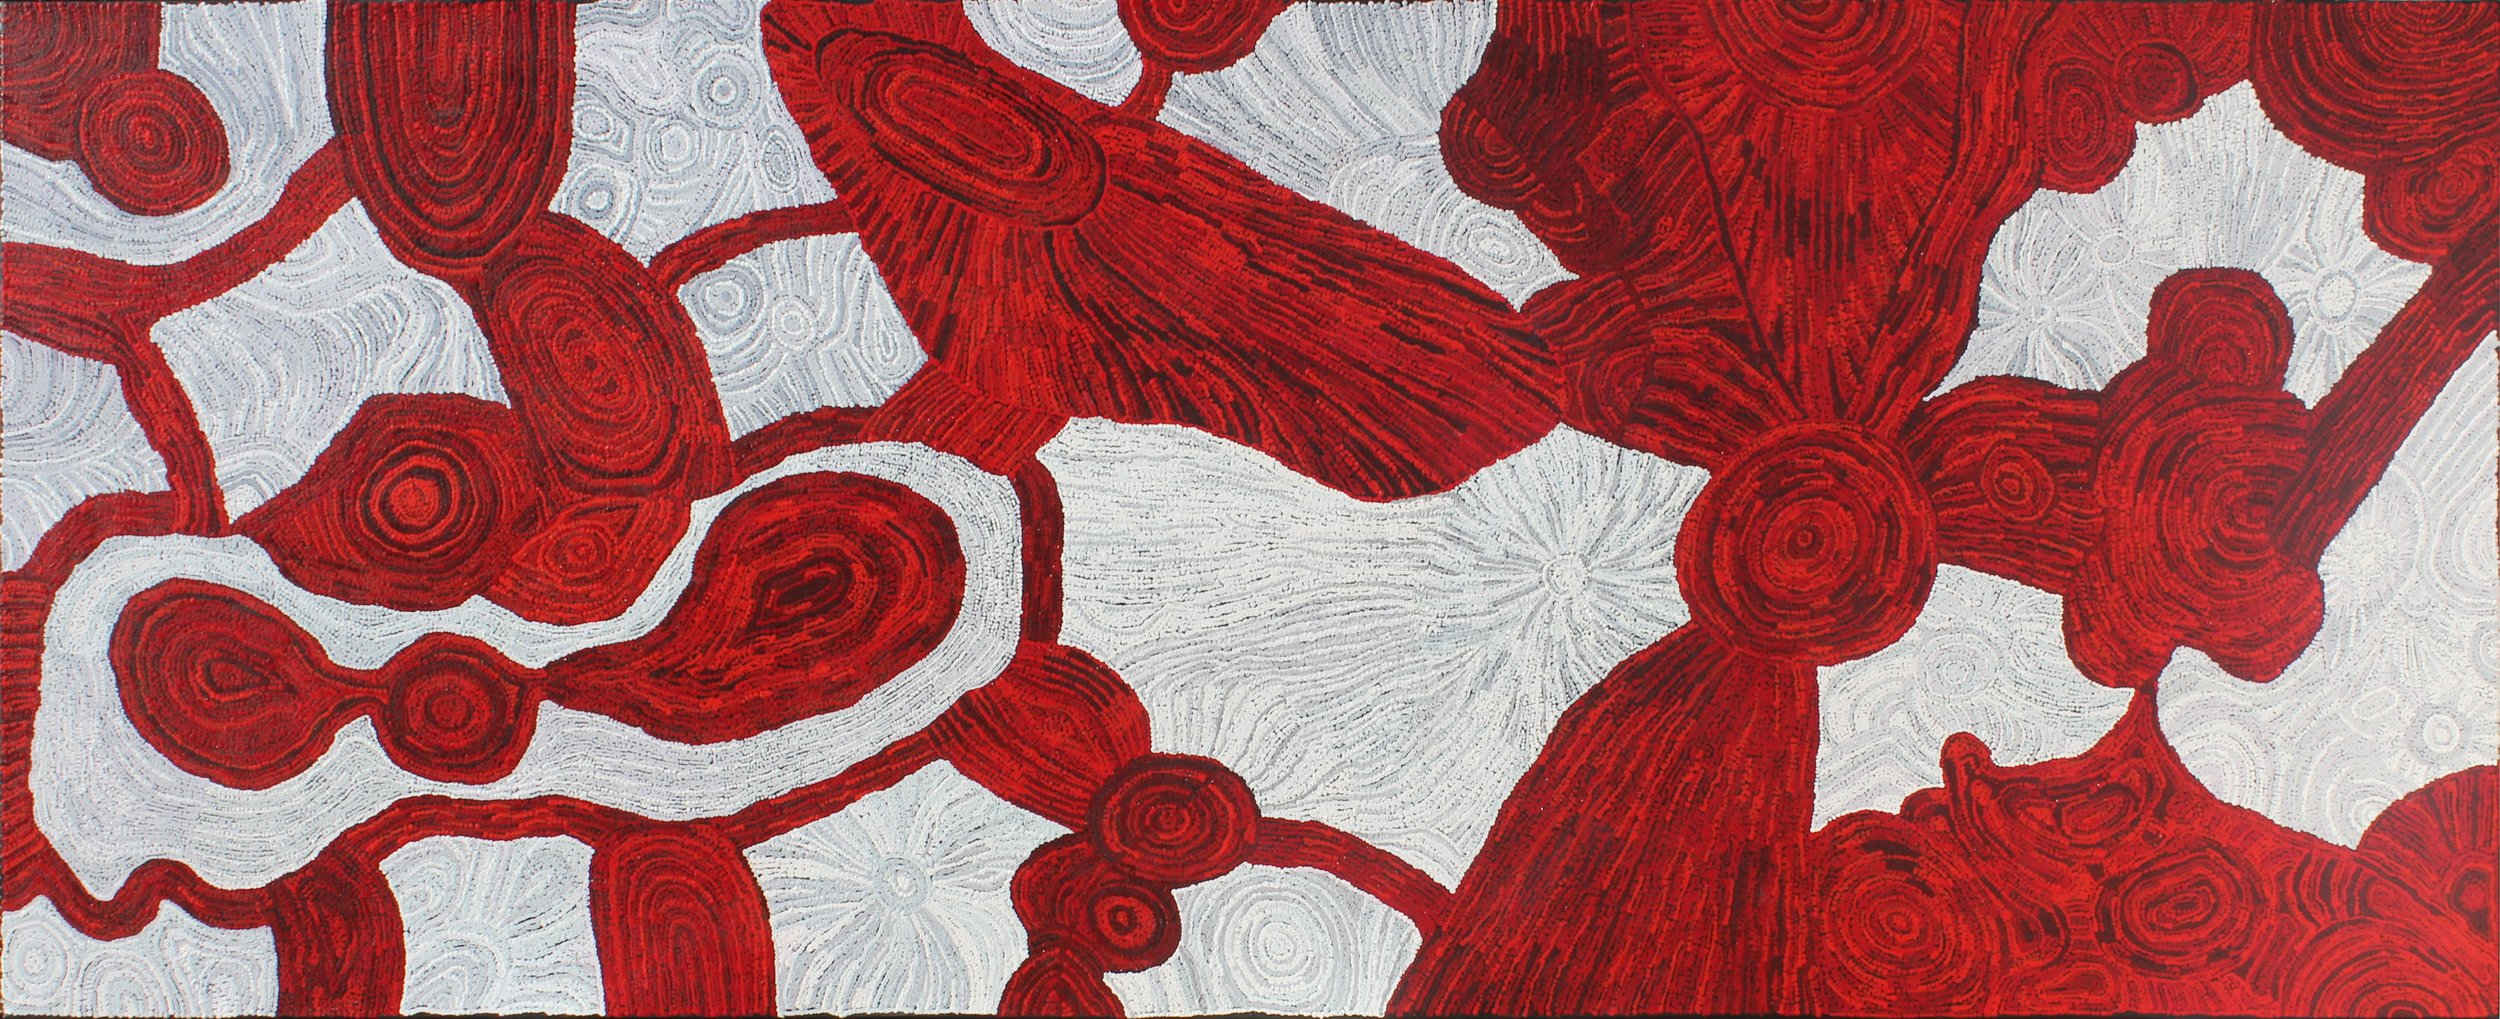 Betty Kauntiwa Pumani . Titre : Antara Tjukurpa - Dreaming Time story. Format : 300 x 120 cm. Cette œuvre gagnante du grand prix de l'art Aborigène en 2016 au Musée National de Darwin, sera exposée au sein de la galerie. © Aboriginal Signature • Estrangin gallery, avec l'autorisation de l'artiste et du Mimili Maku Art Center